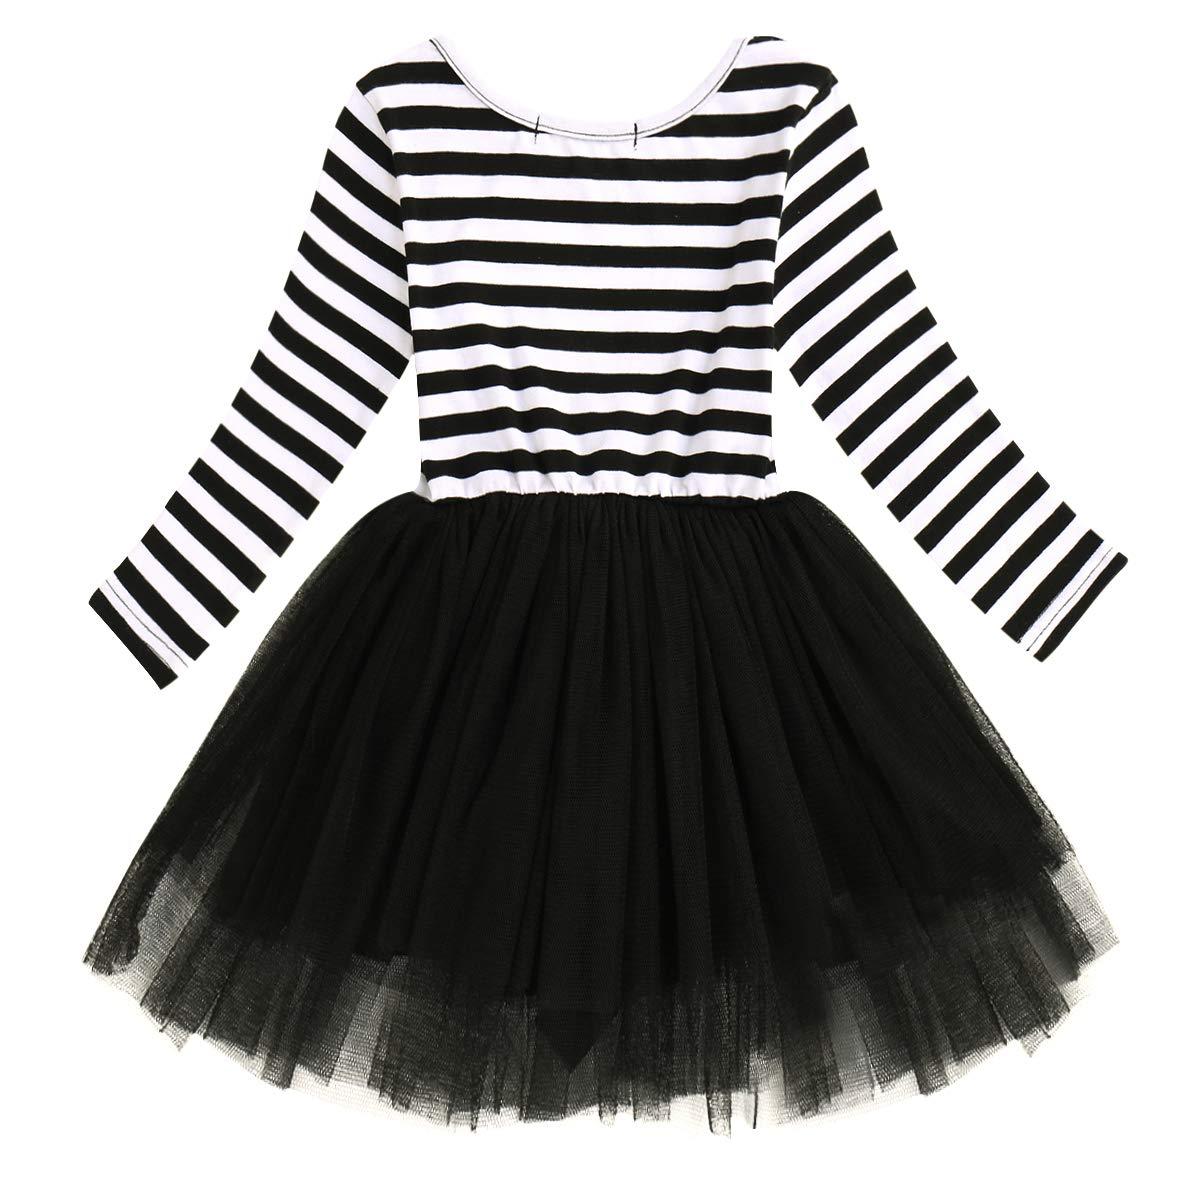 5e5ea14cca32 Amazon.com  Cake Smash Outfit Baby Girls 1st 2nd 3rd Birthday Dress ...